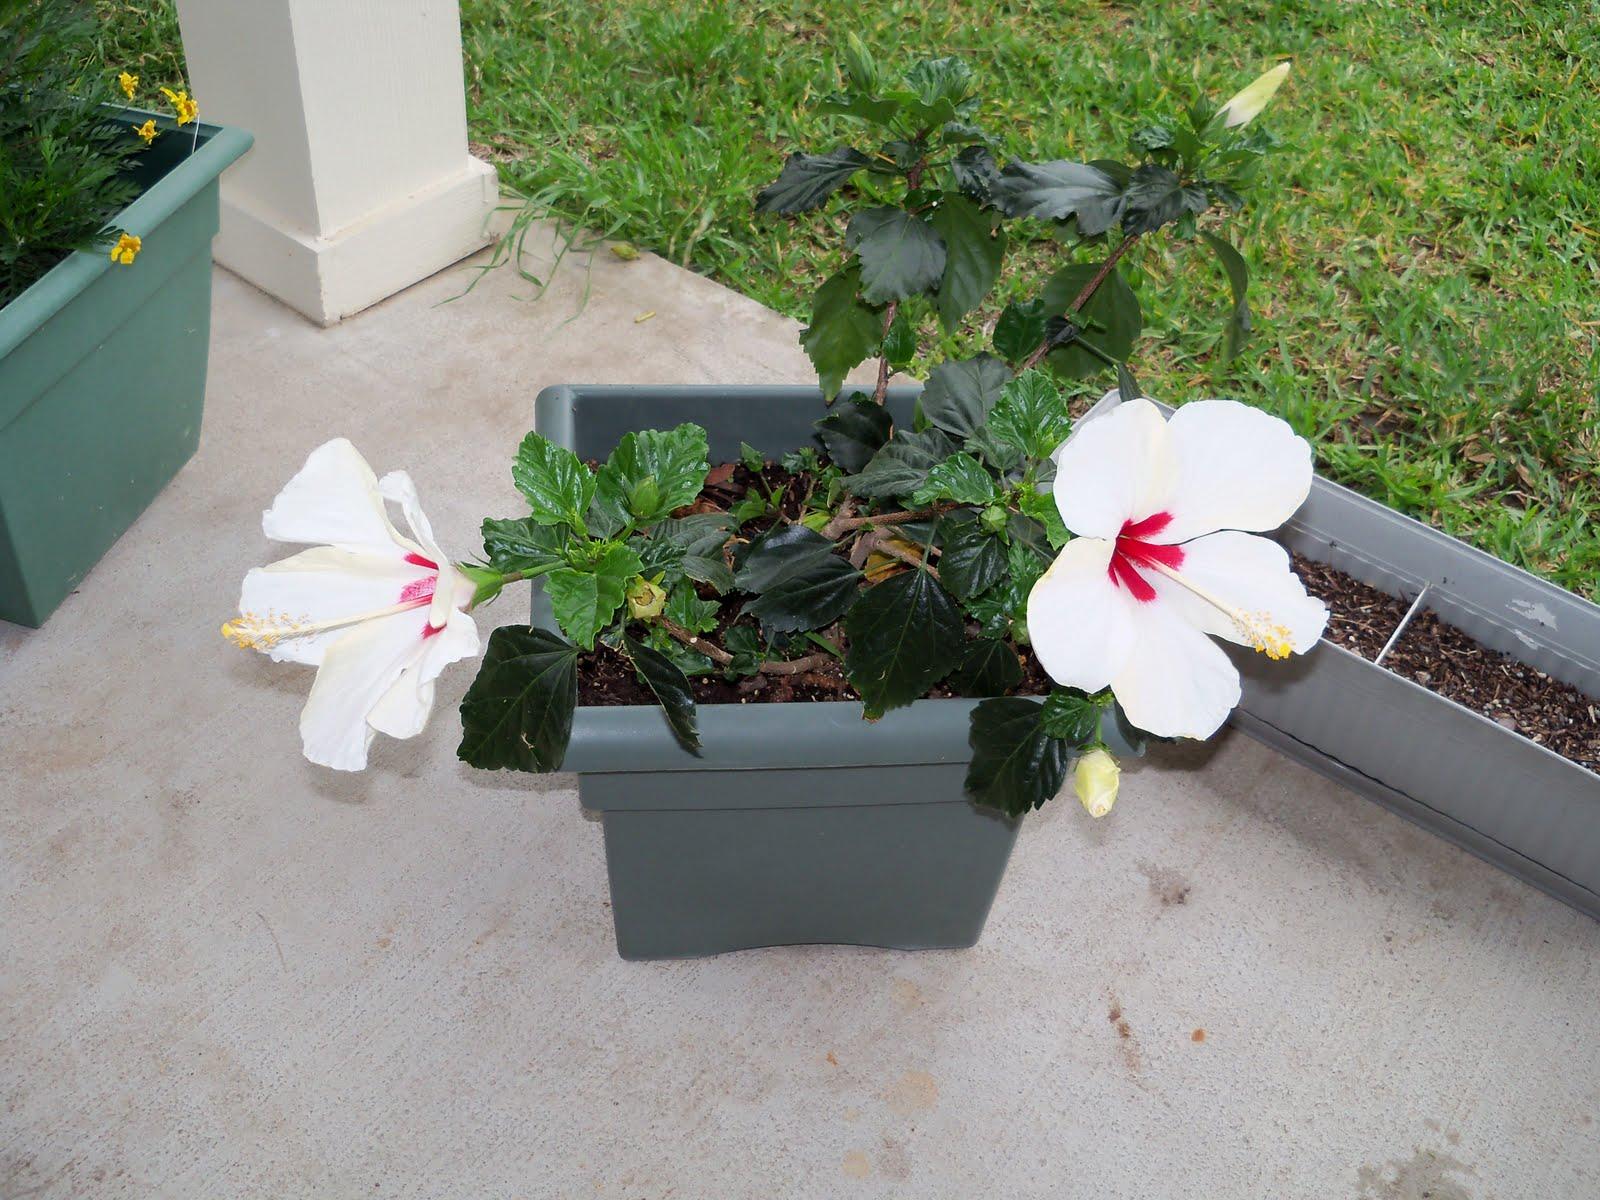 Gardening 2010 - 101_1553.JPG